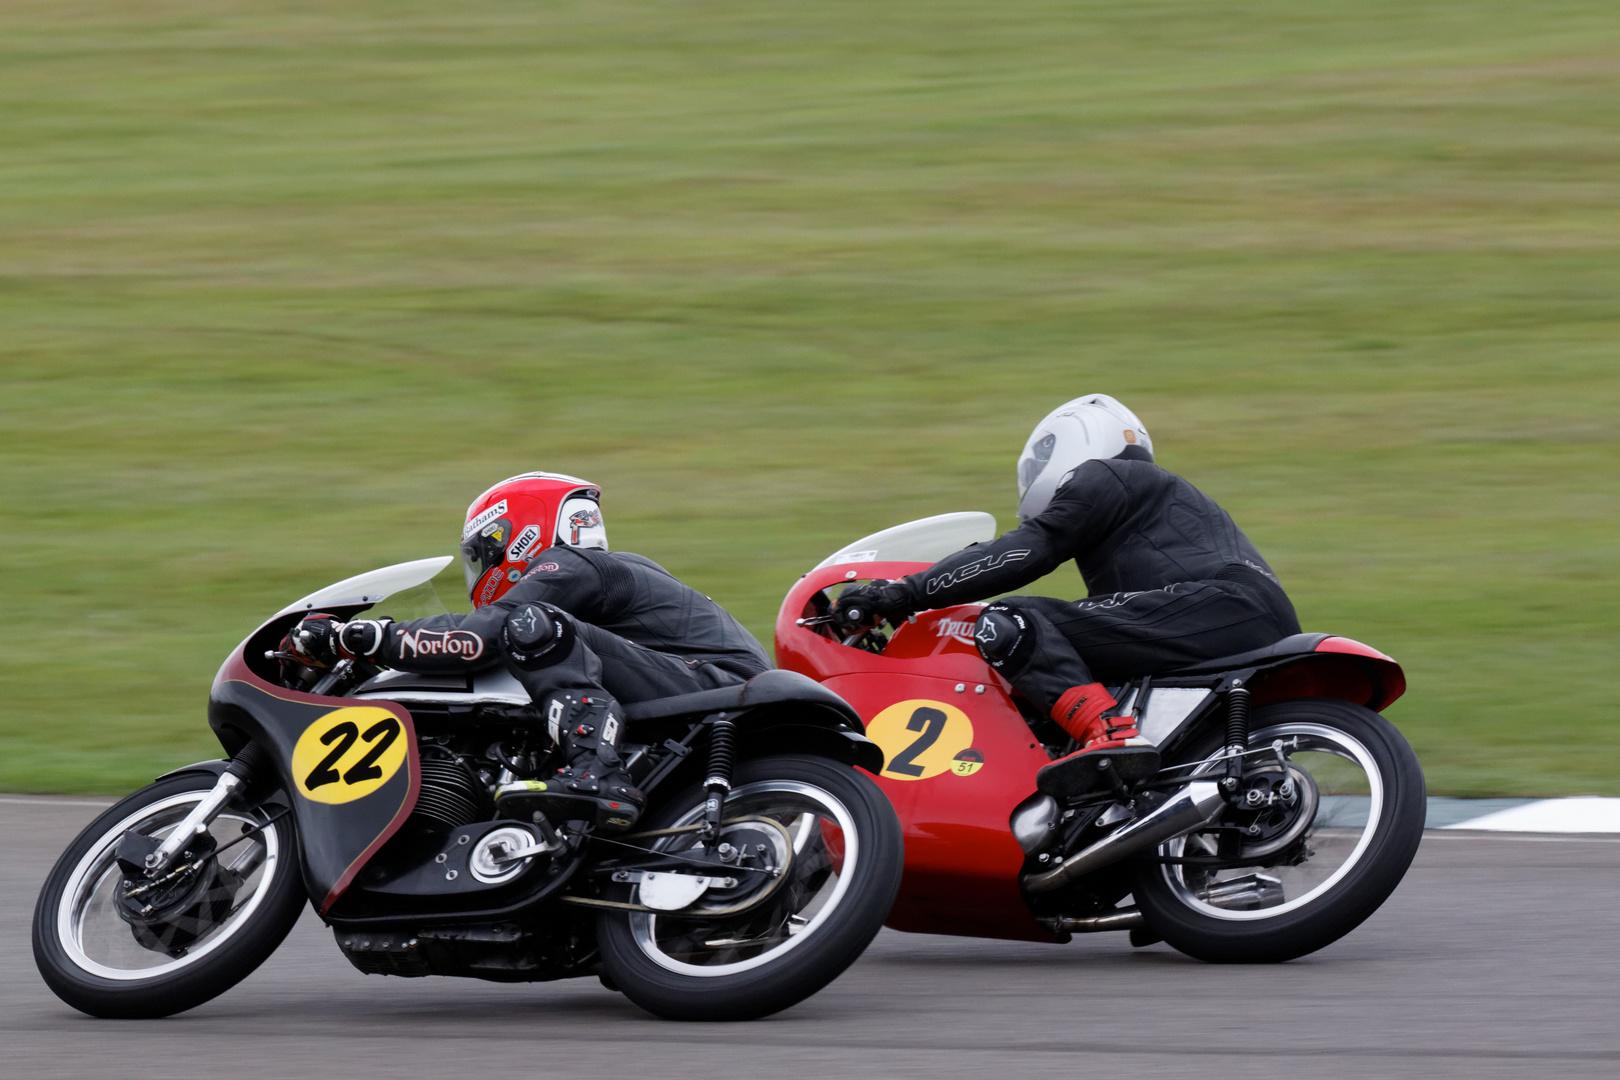 Goodwood Revival 2013 - Barry Sheene Memorial Race